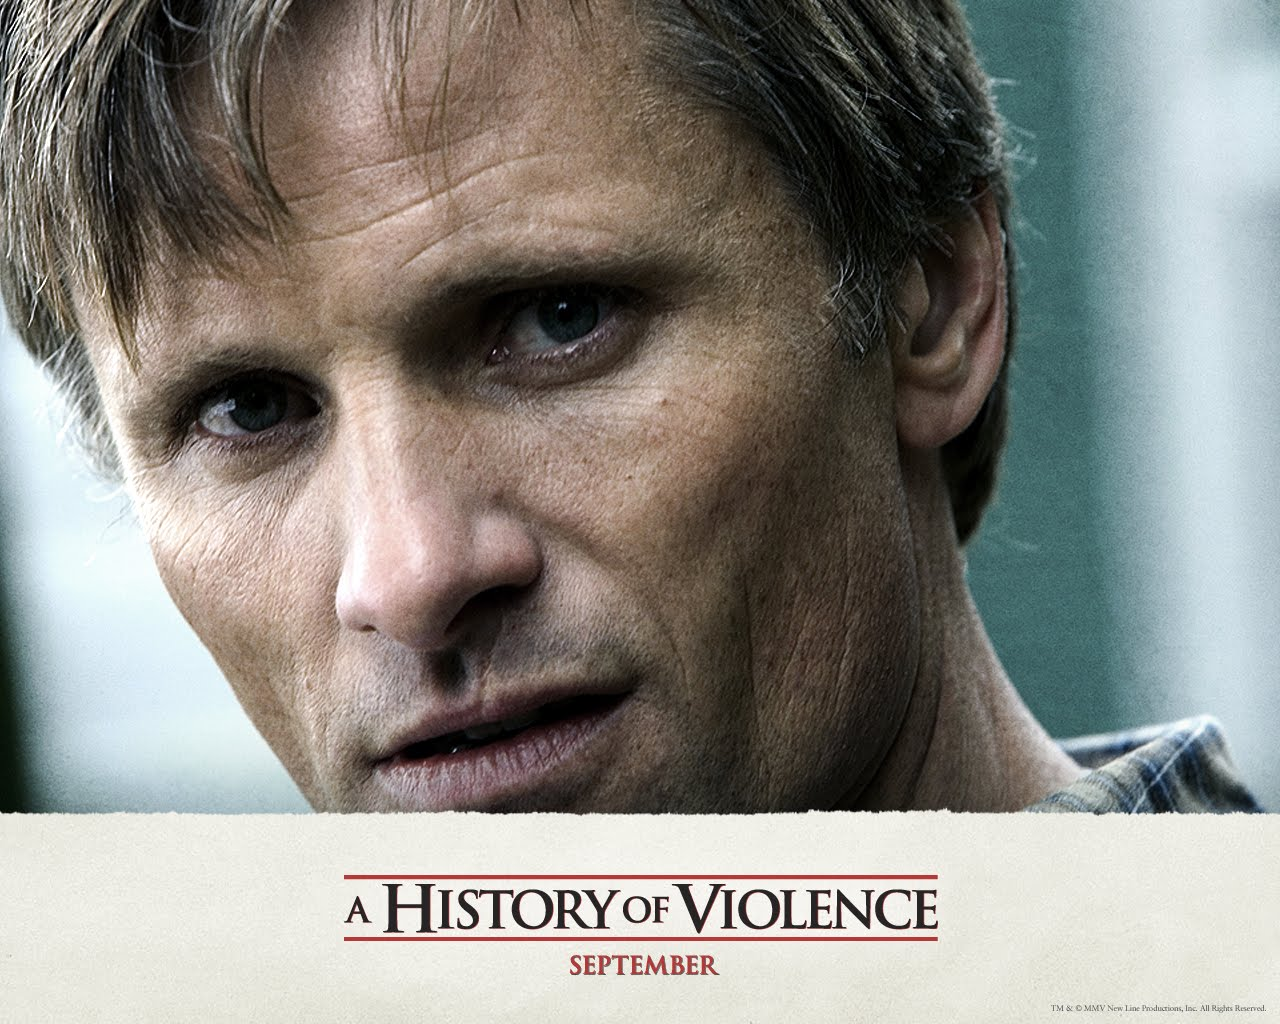 http://2.bp.blogspot.com/_5b2Ch2gig2c/S-8LYxOdVXI/AAAAAAAAERk/gYaSHyJZ9OI/s1600/Viggo_Mortensen_in_A_History_of_Violence_Wallpaper_2_1280.jpg